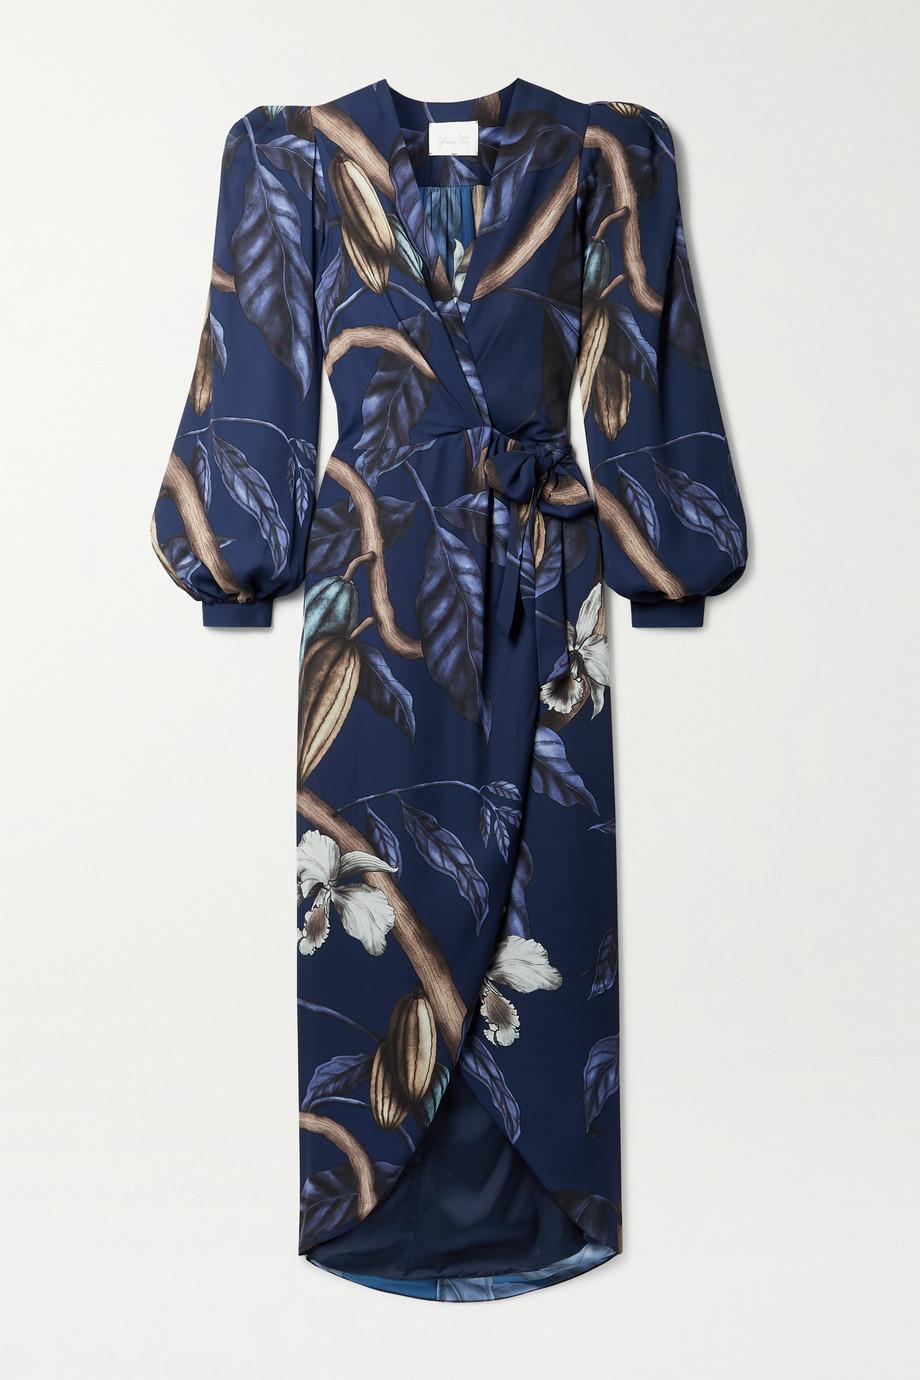 Johanna Ortiz + NET SUSTAIN Reino Vegetal bedrucktes Midi-Wickelkleid aus recyceltem Satin